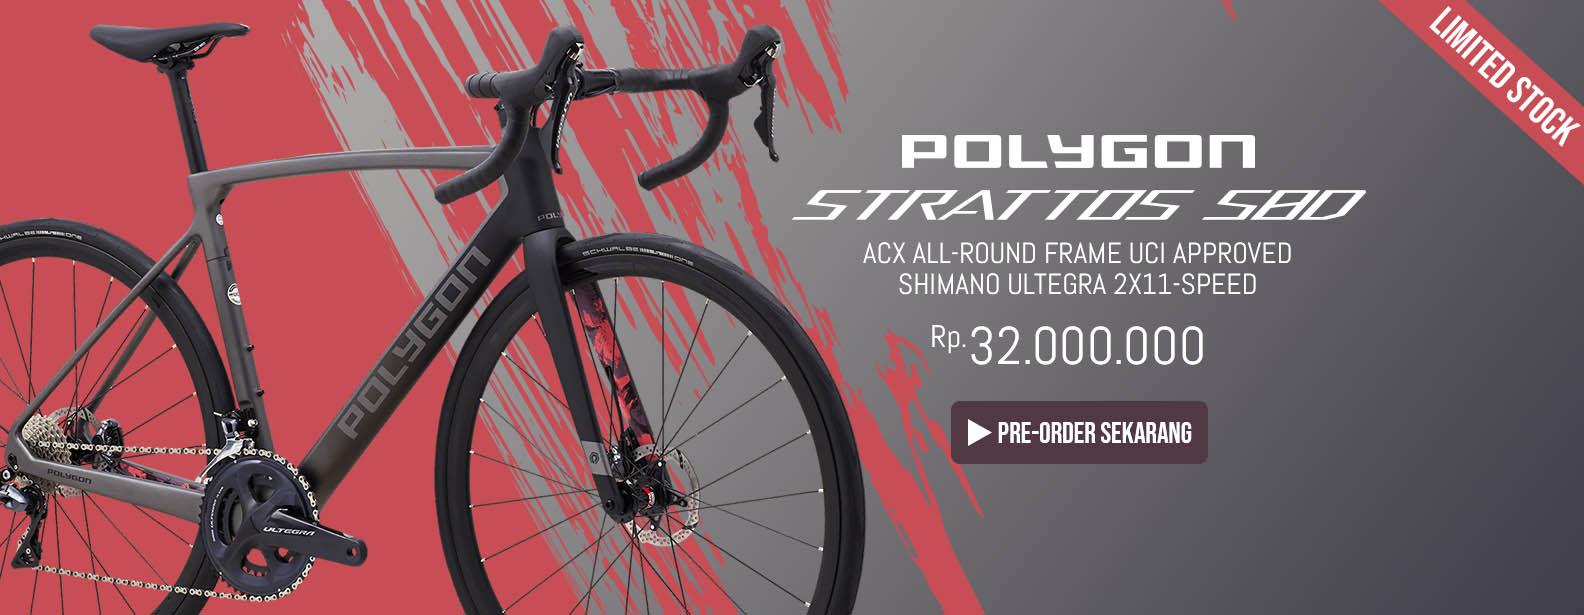 Polygon Sepeda Road Strattos S8 Disc